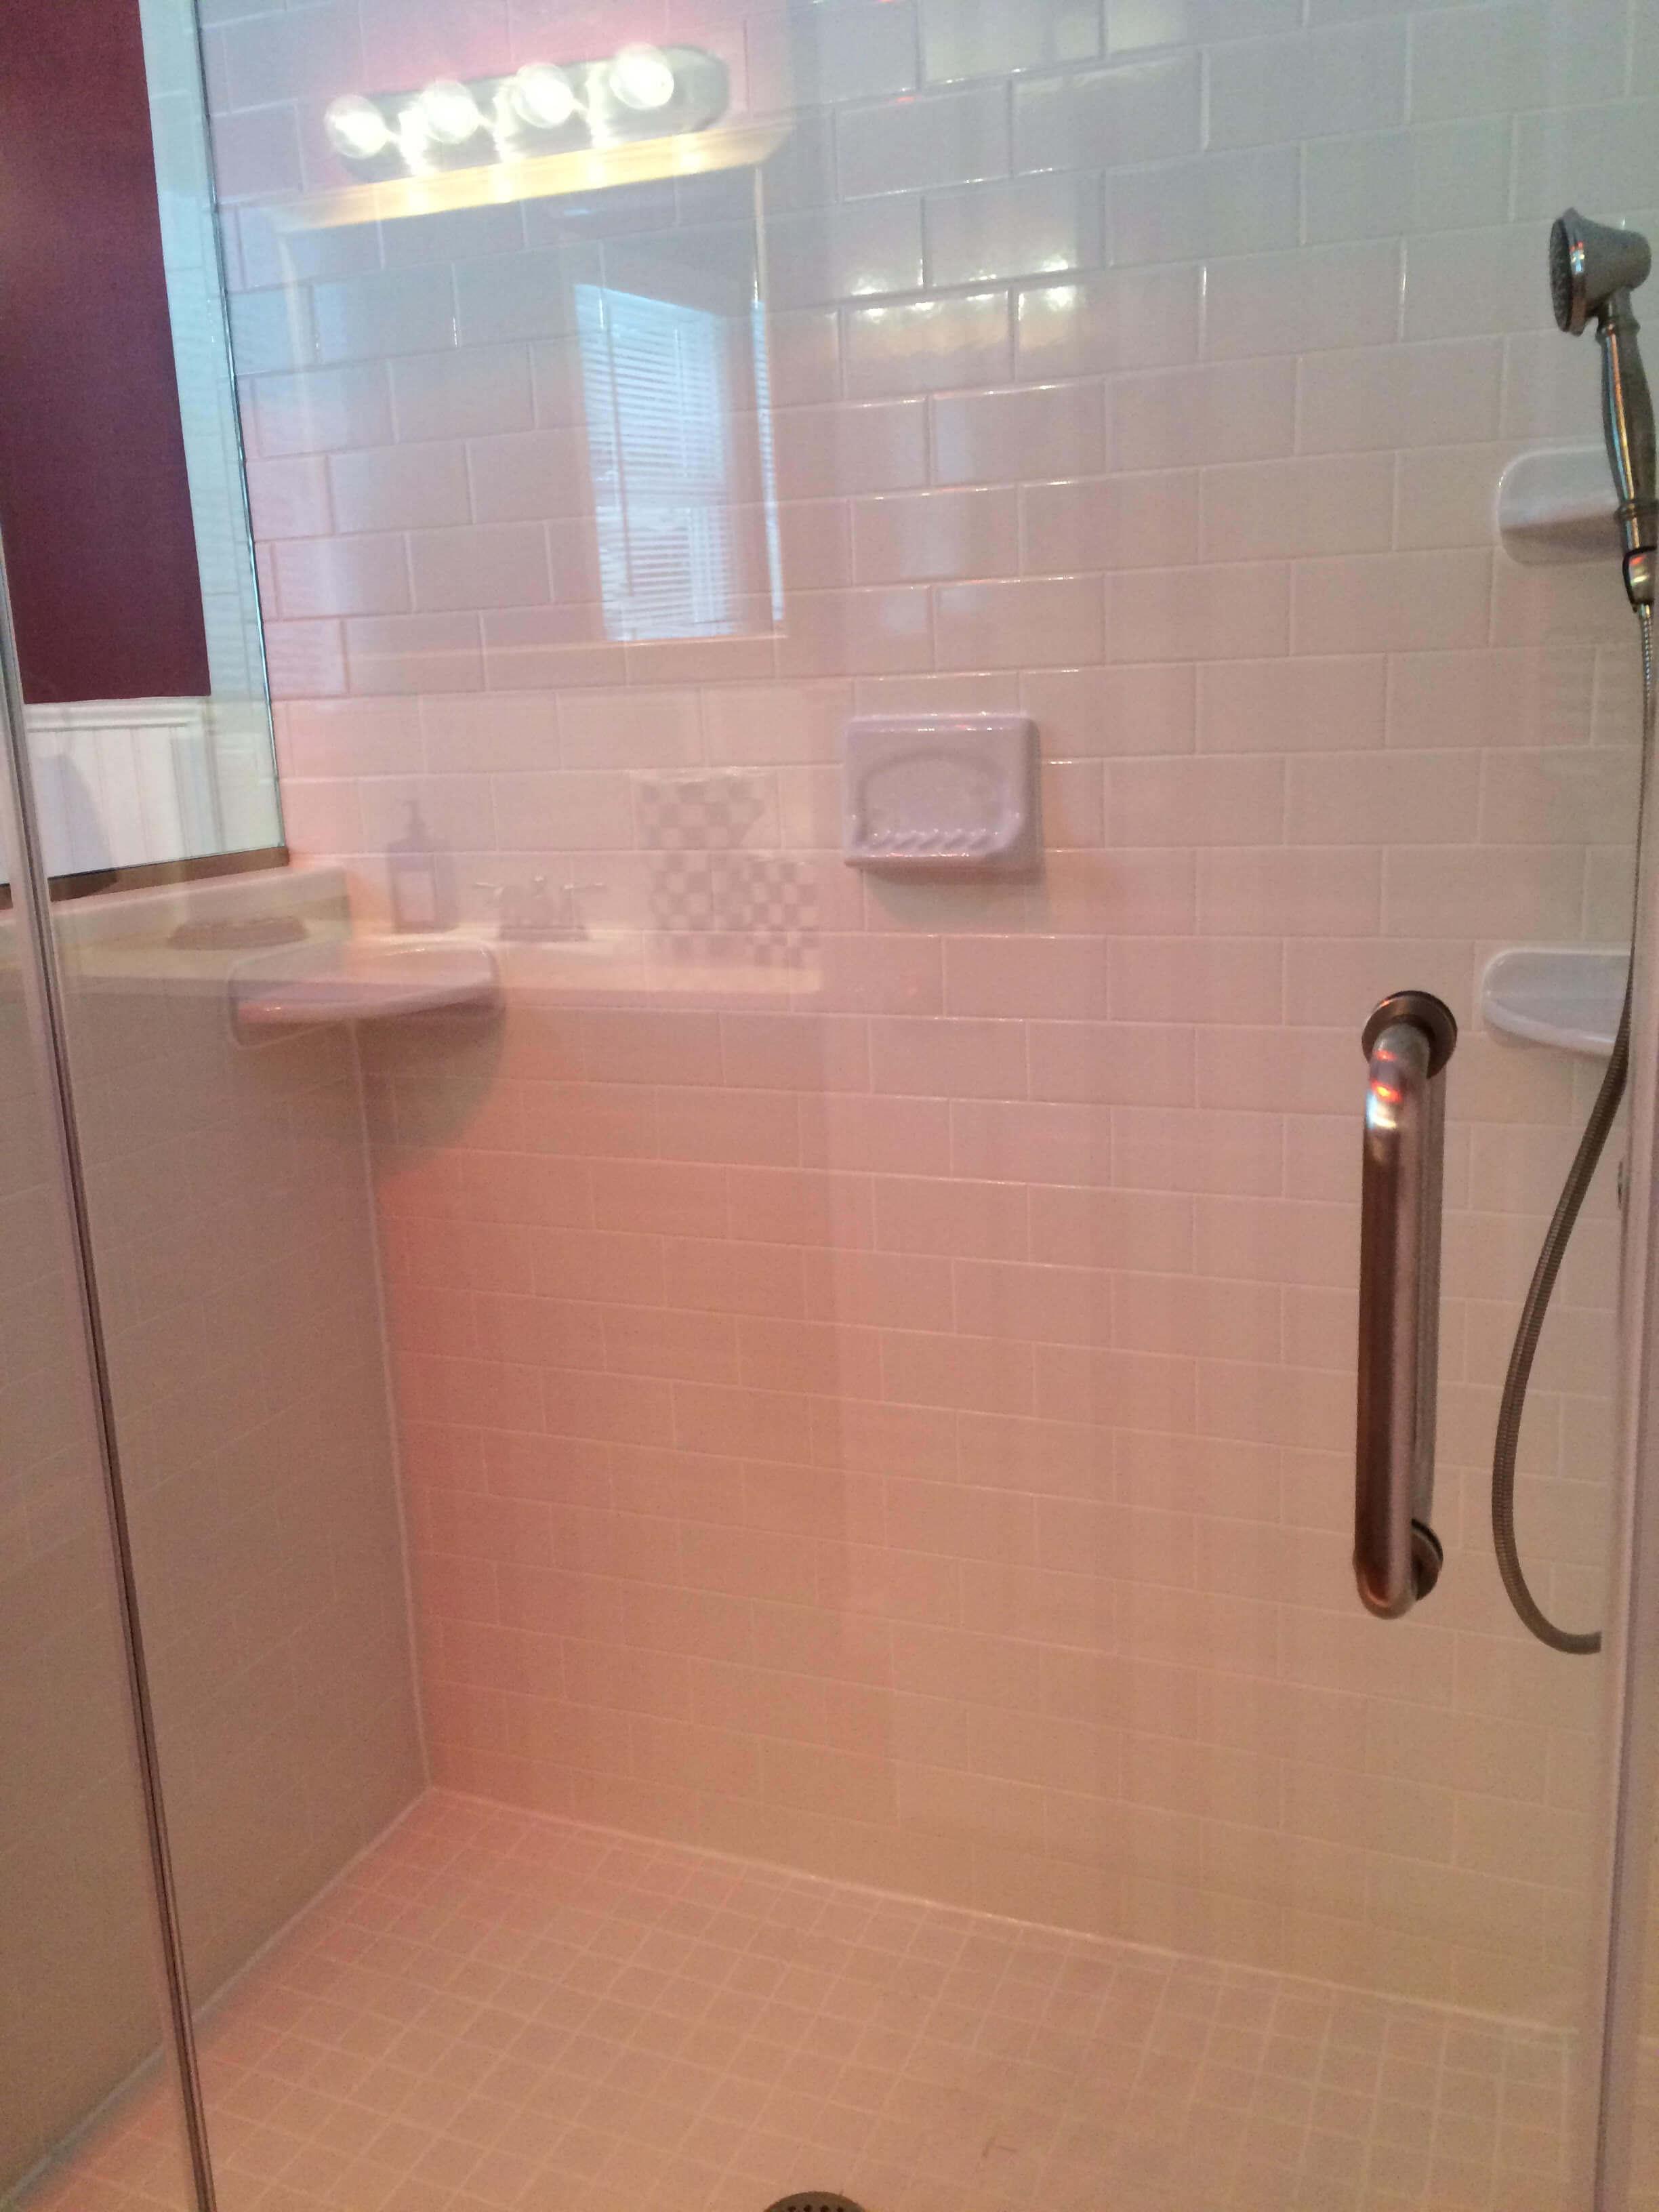 Custom Accessible Bathroom Remodel In Lebanon Twp NJ - Accessible bathroom remodel